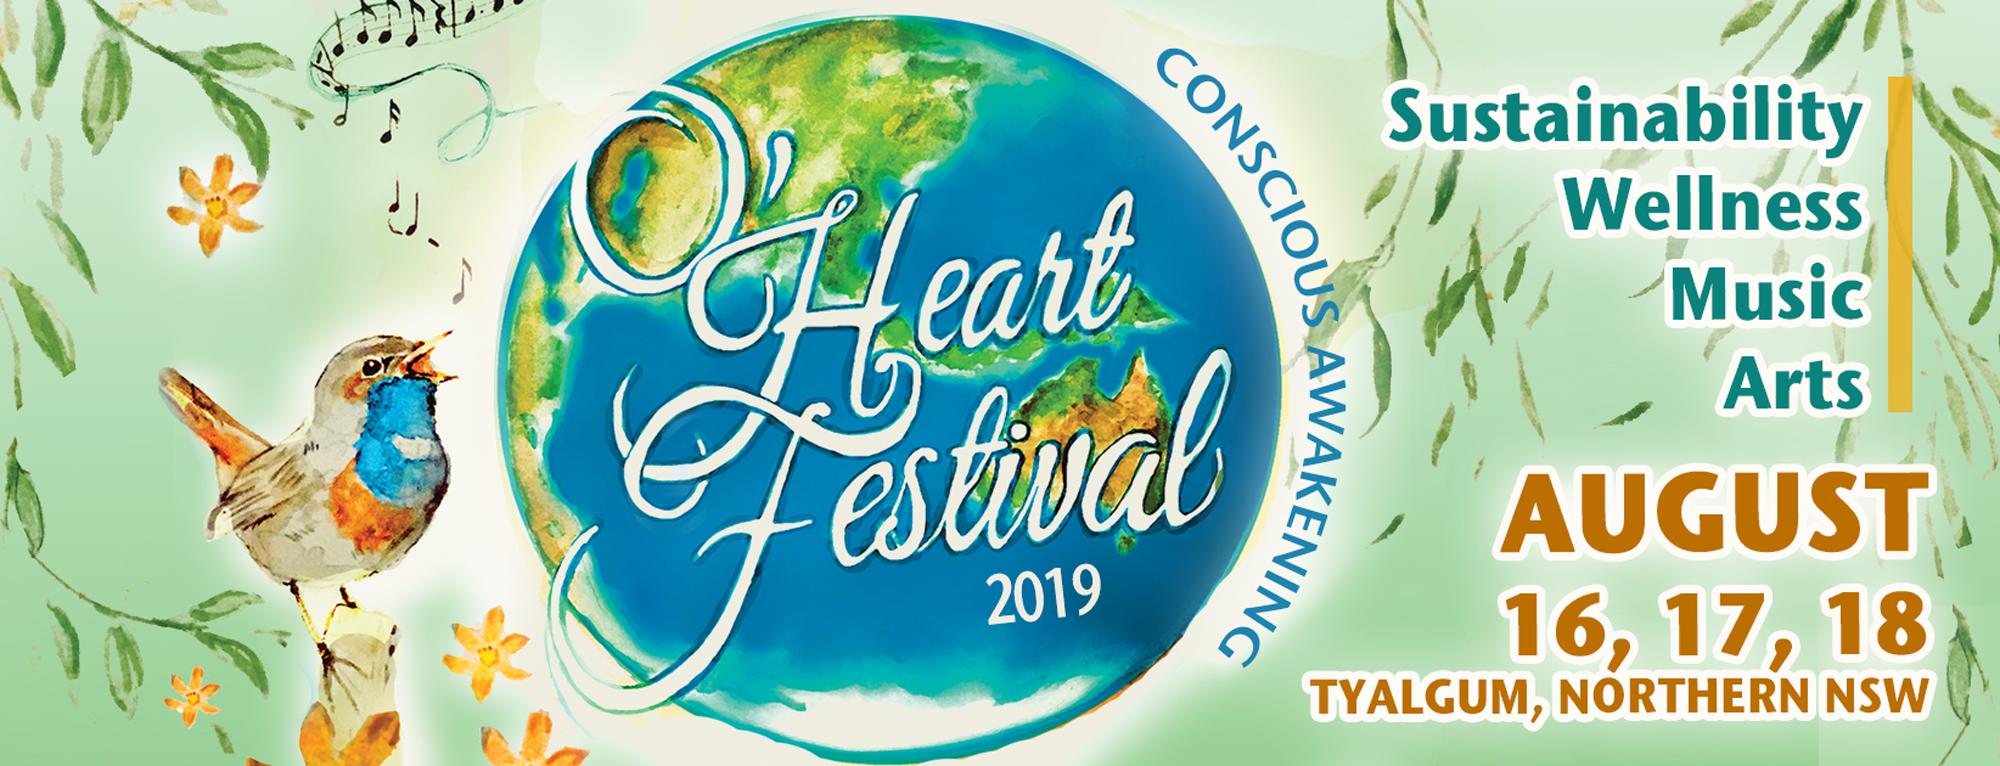 Homepage 2019 - O'Heart Festival